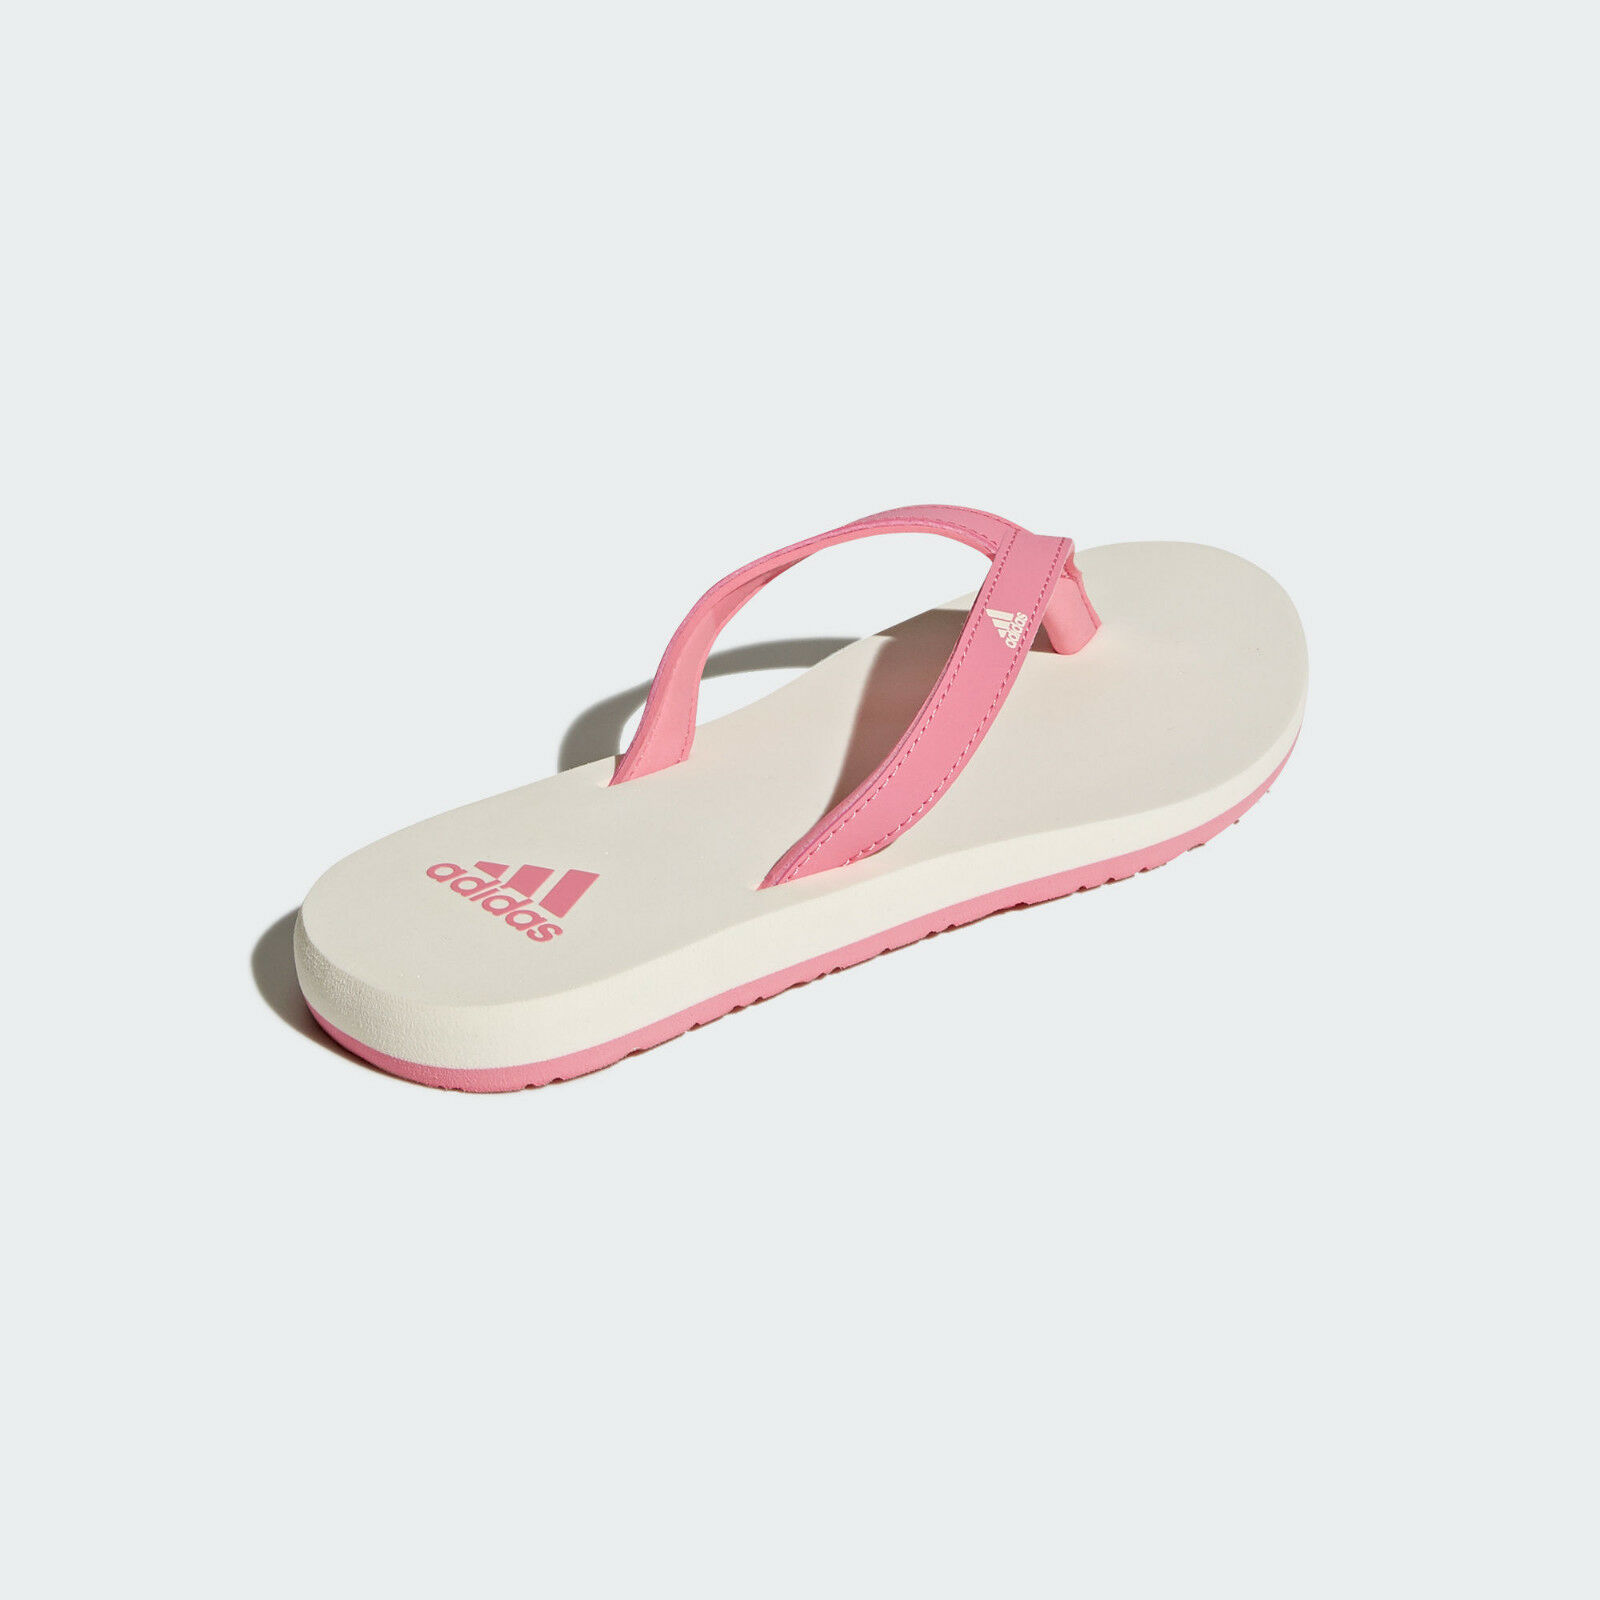 Eezay Flip Flop infradito Adidas